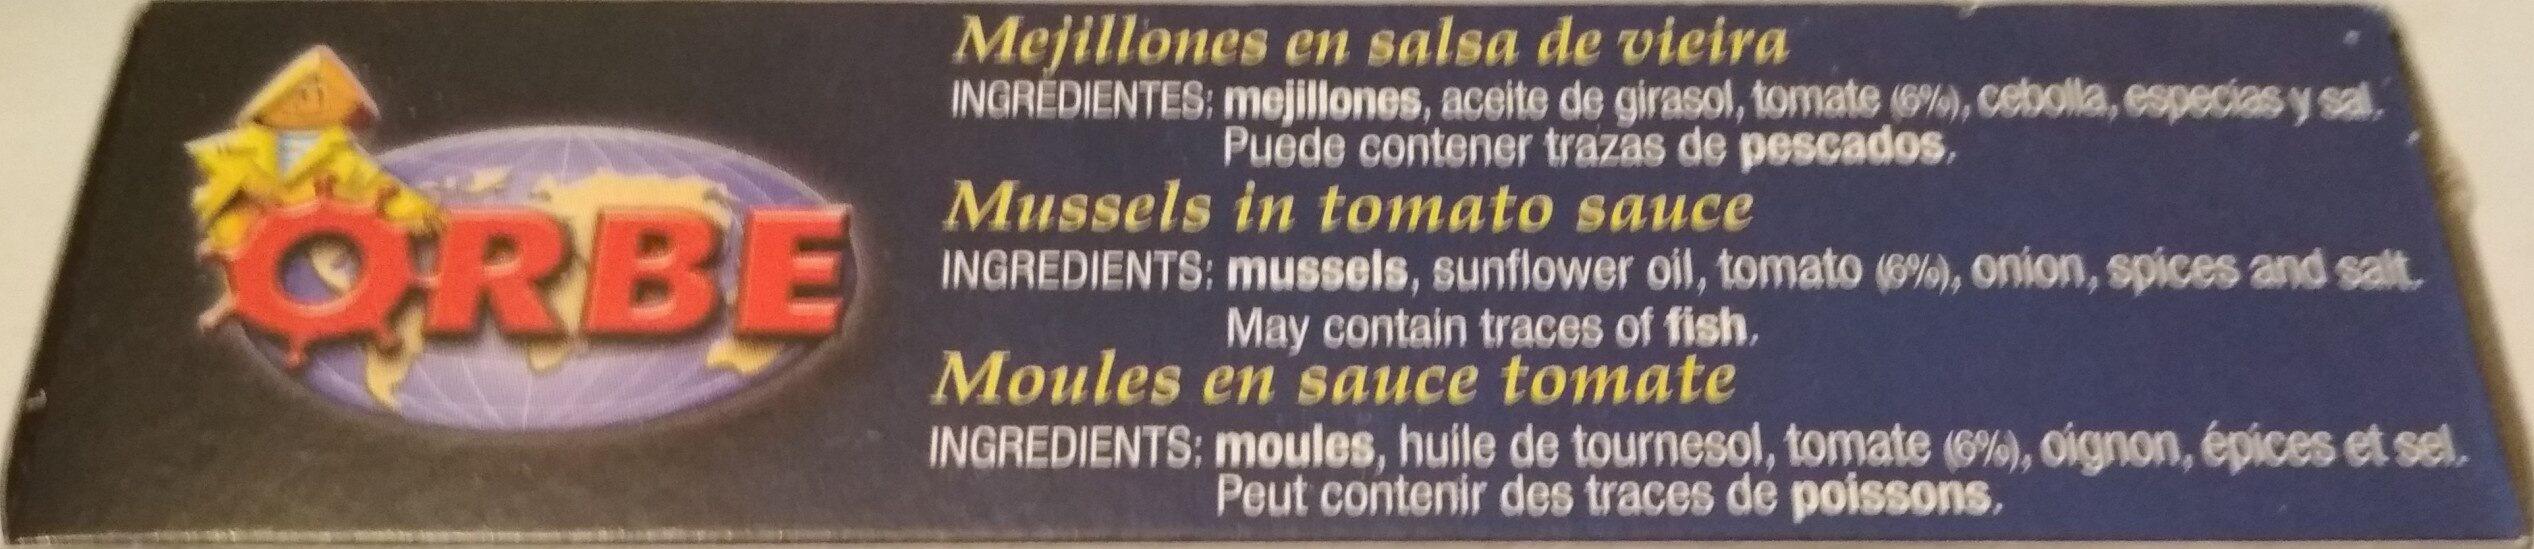 Mejillones en salsa vieira - Ingredients - es